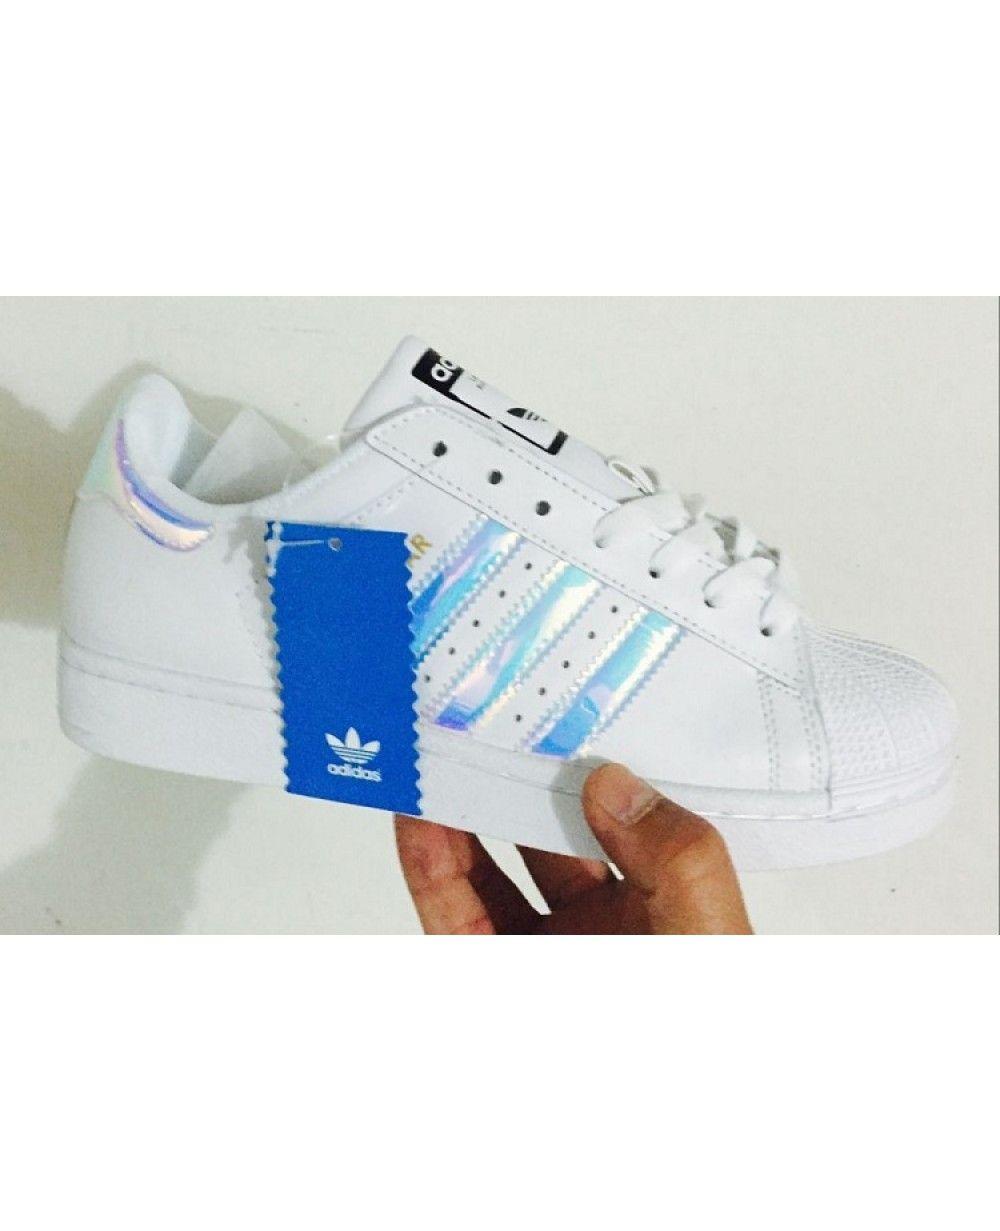 adidas superstar ologramma iridescente bianco